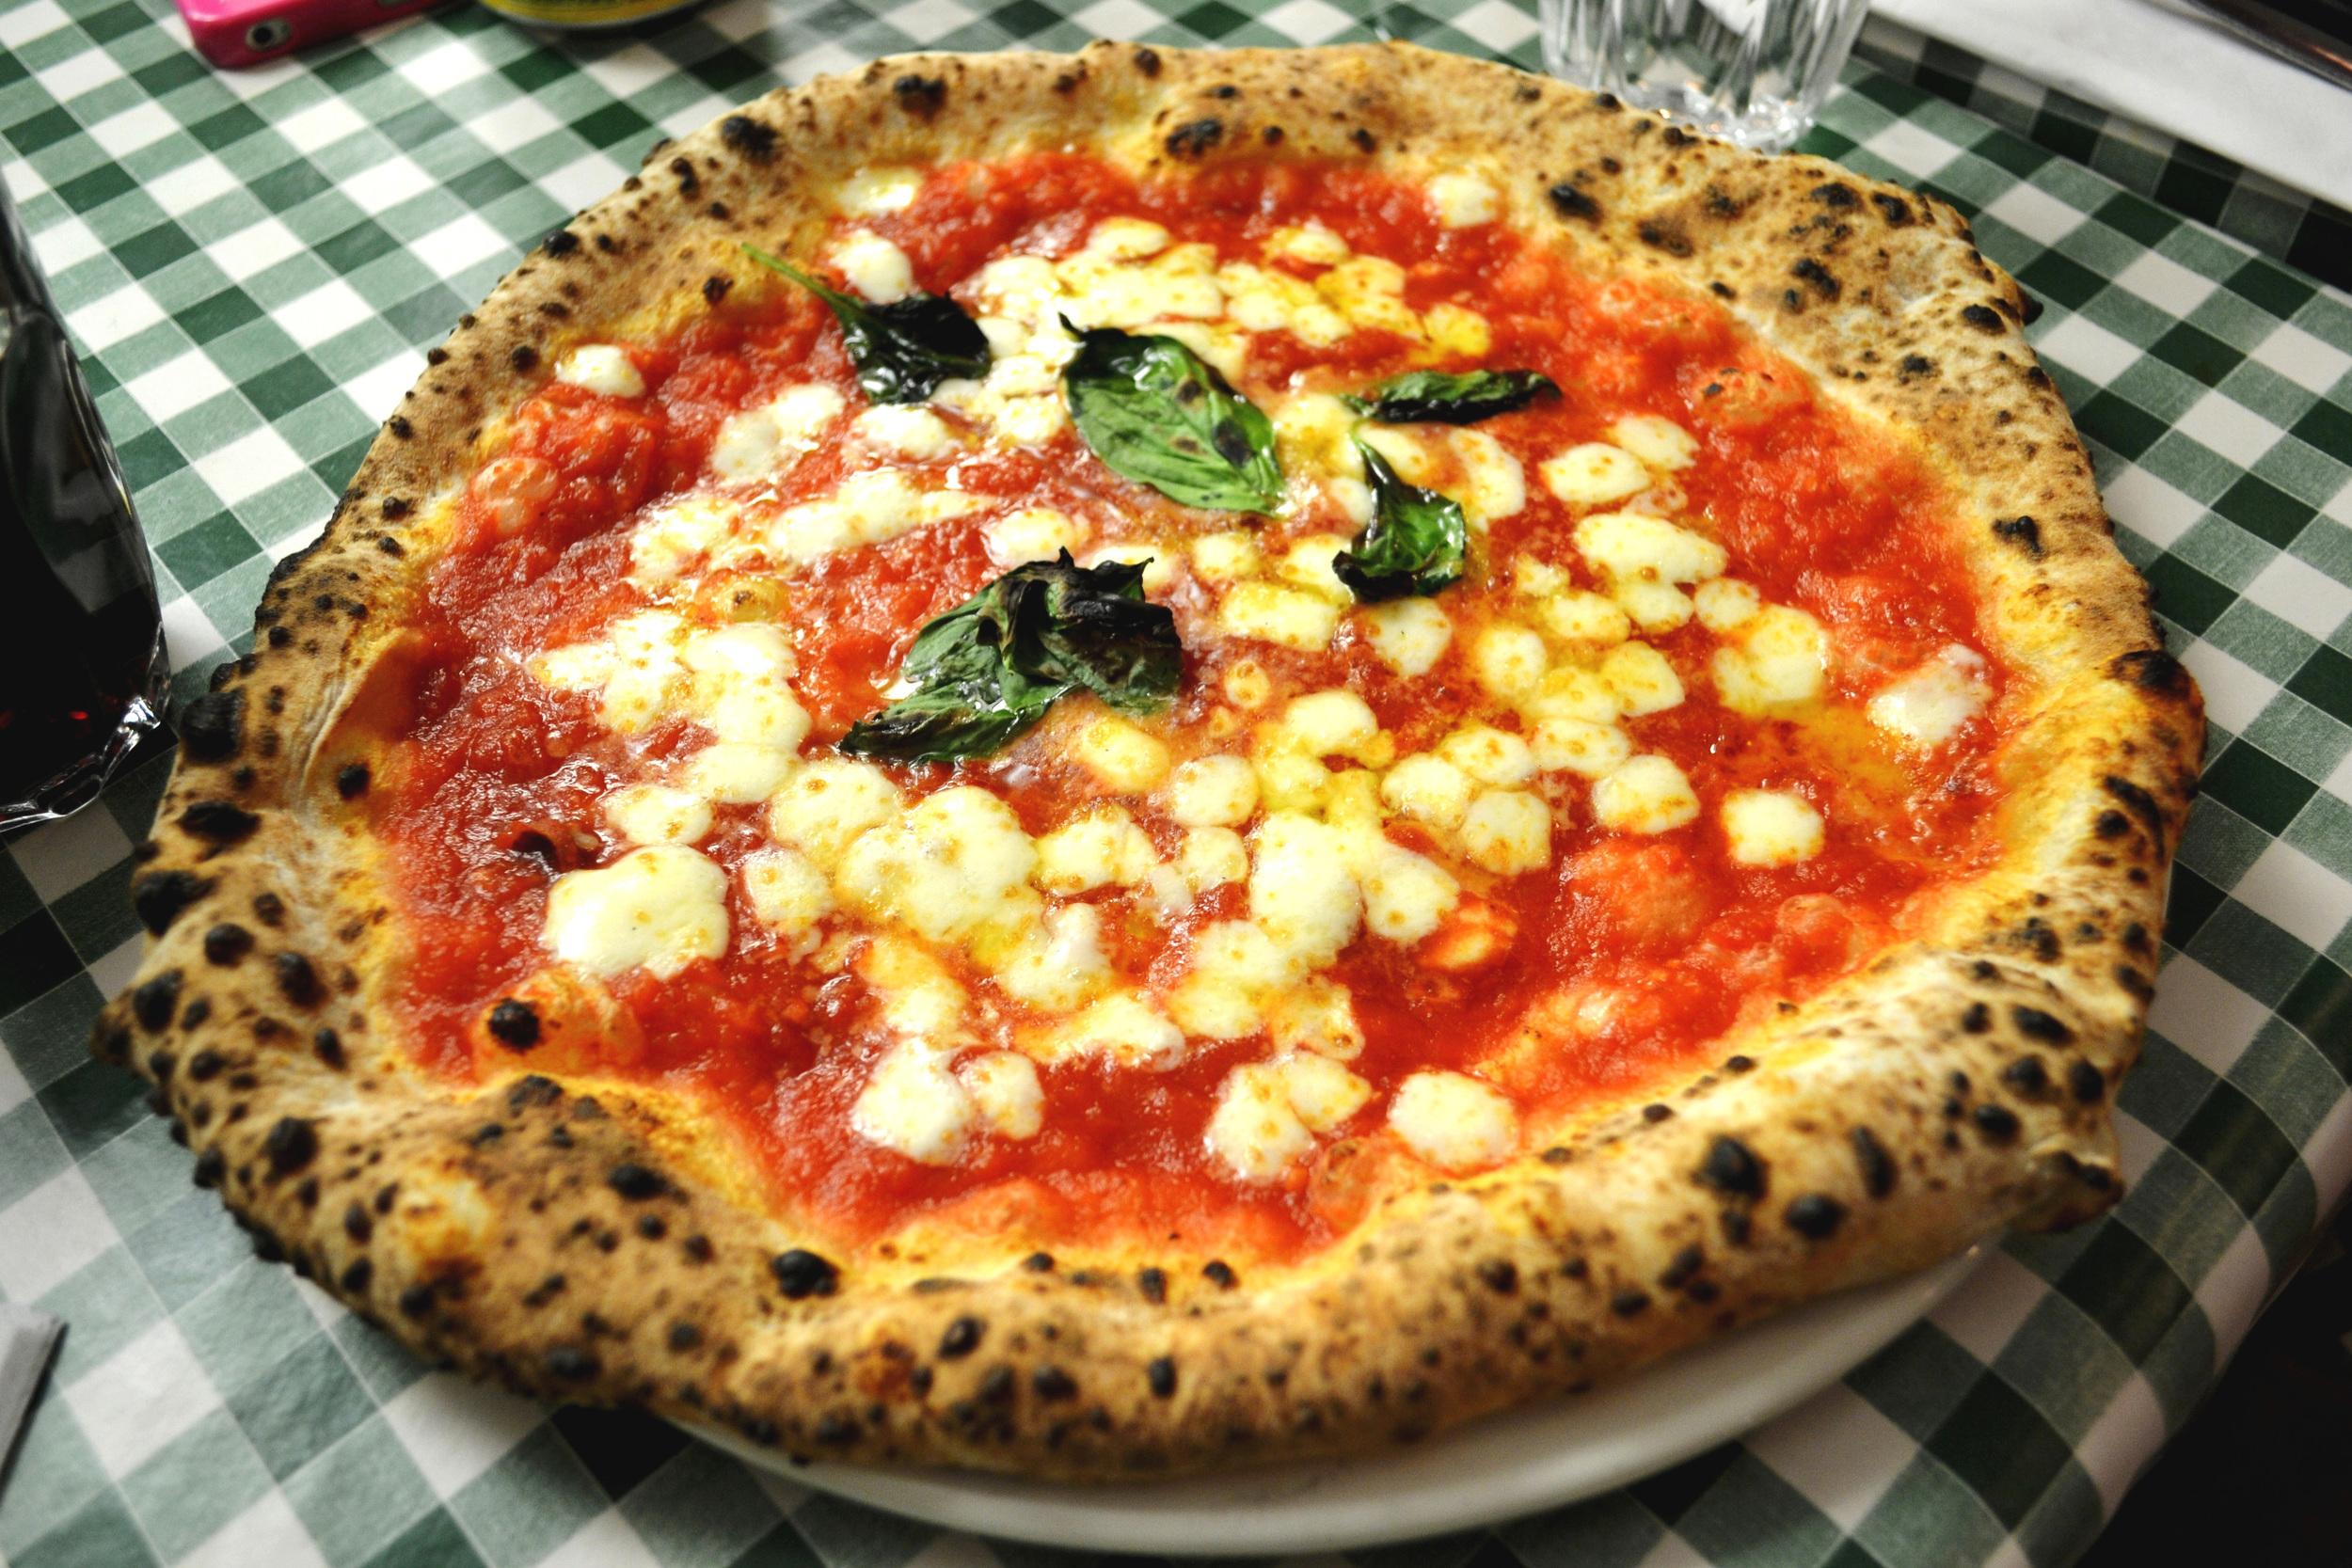 Margherita pizza from Pizza Pilgrims